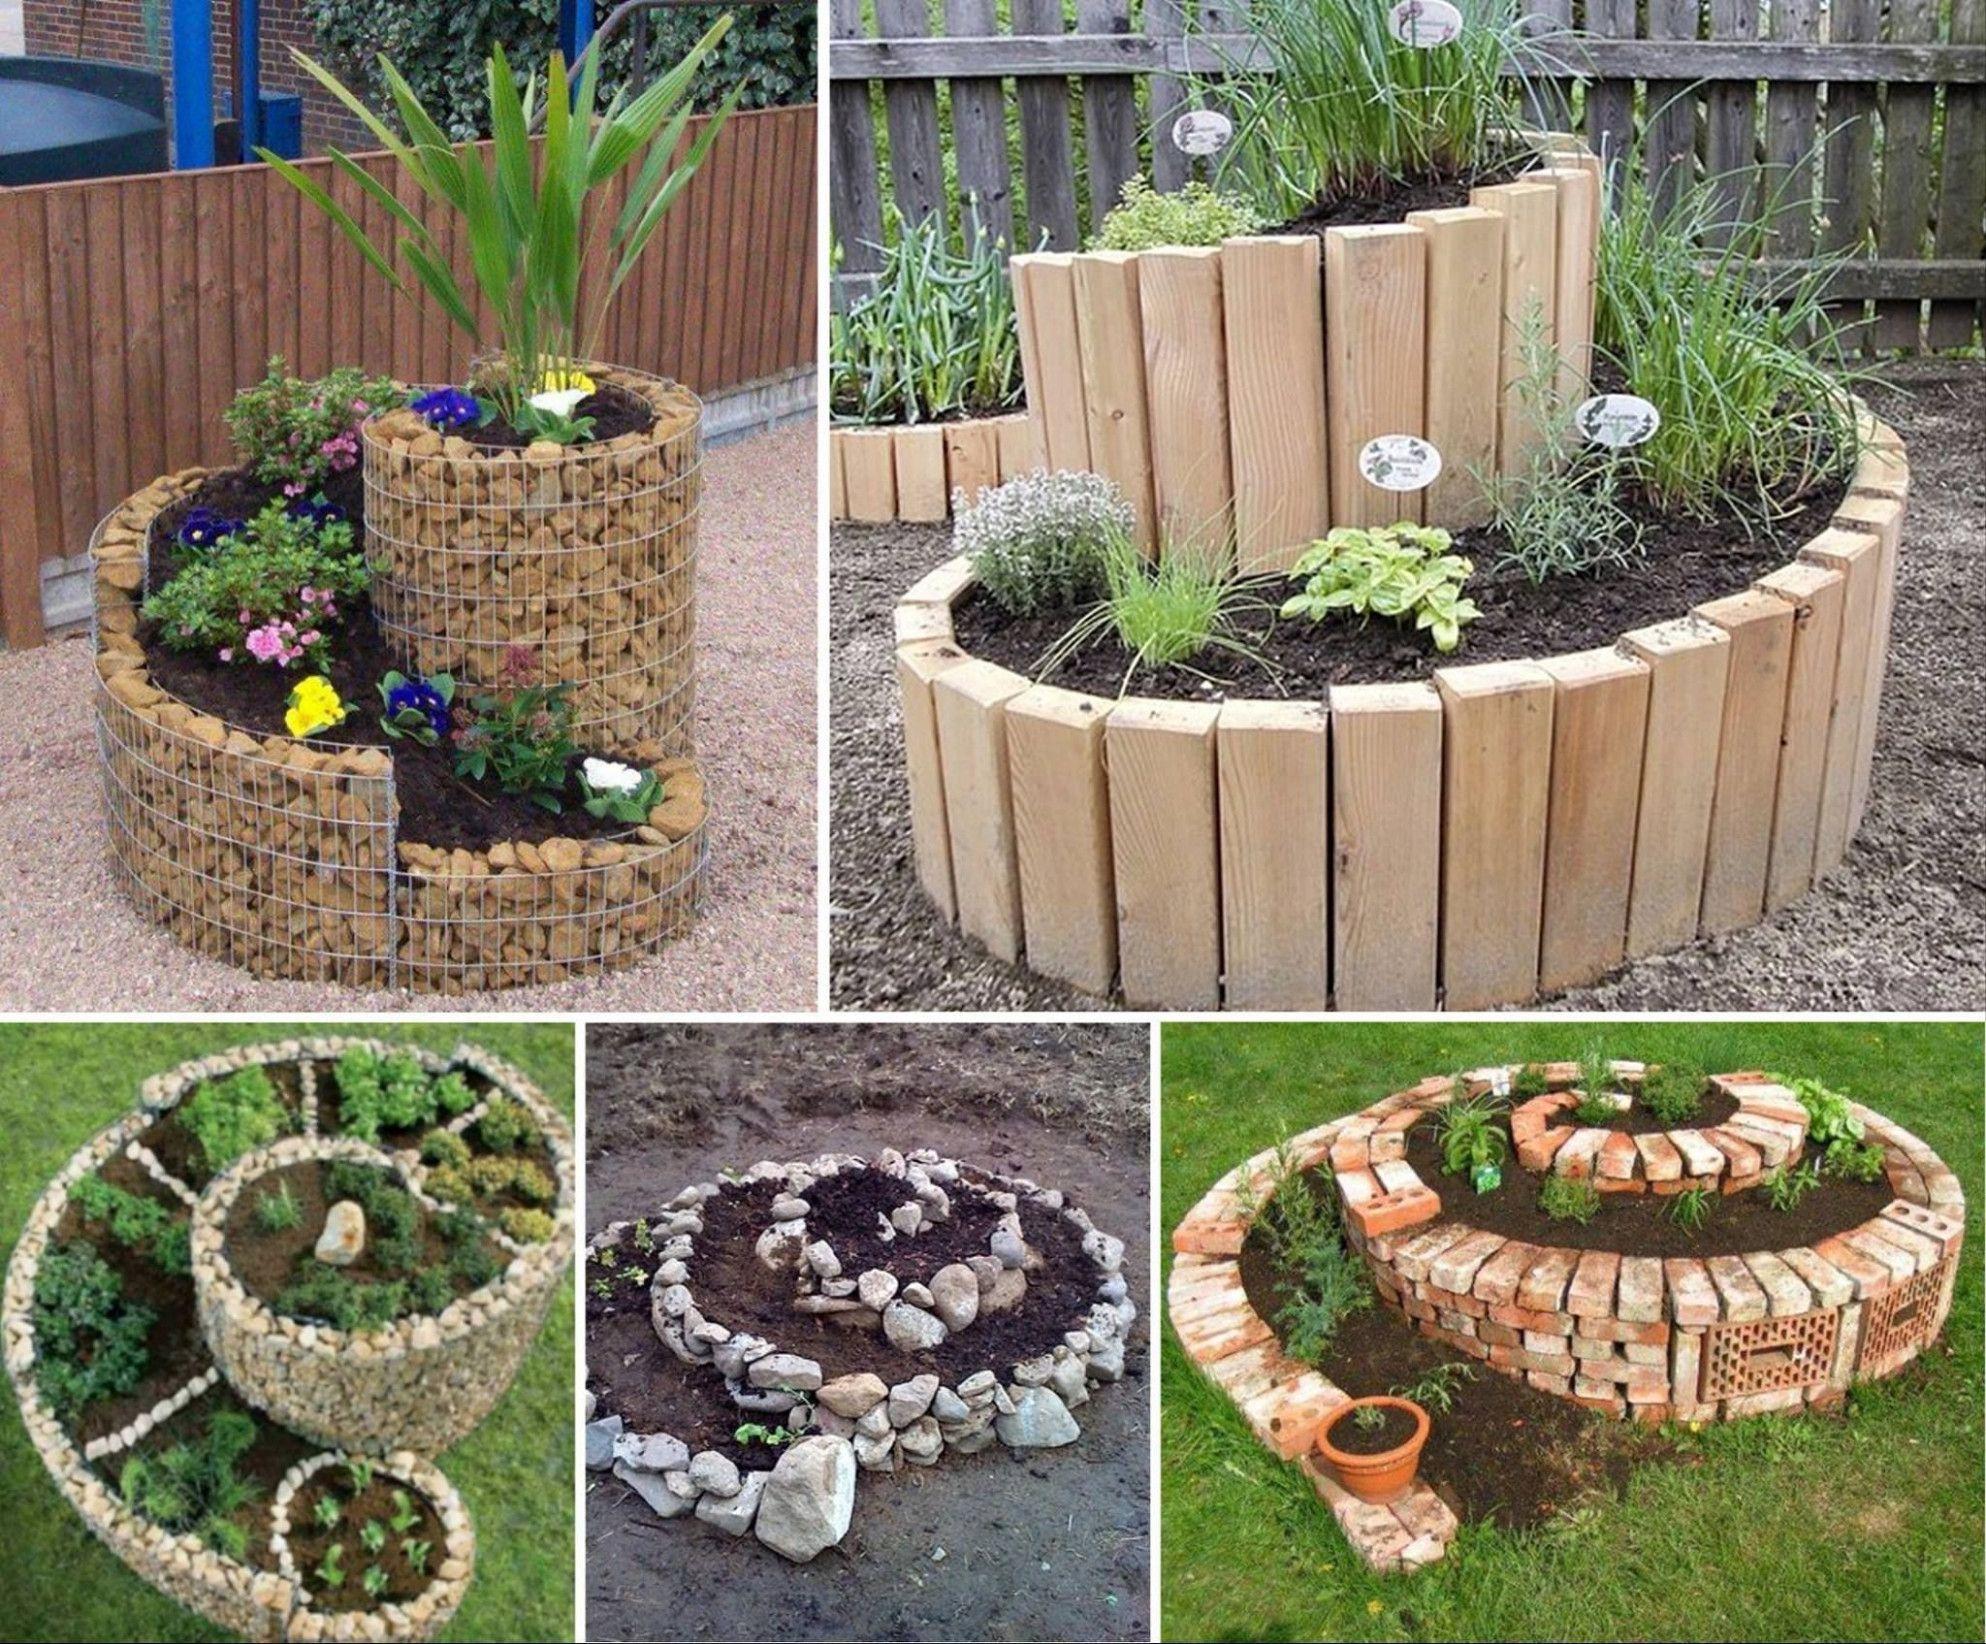 The Most Awesome 28 Diy Garden Ideas  Gardening design diy, Diy